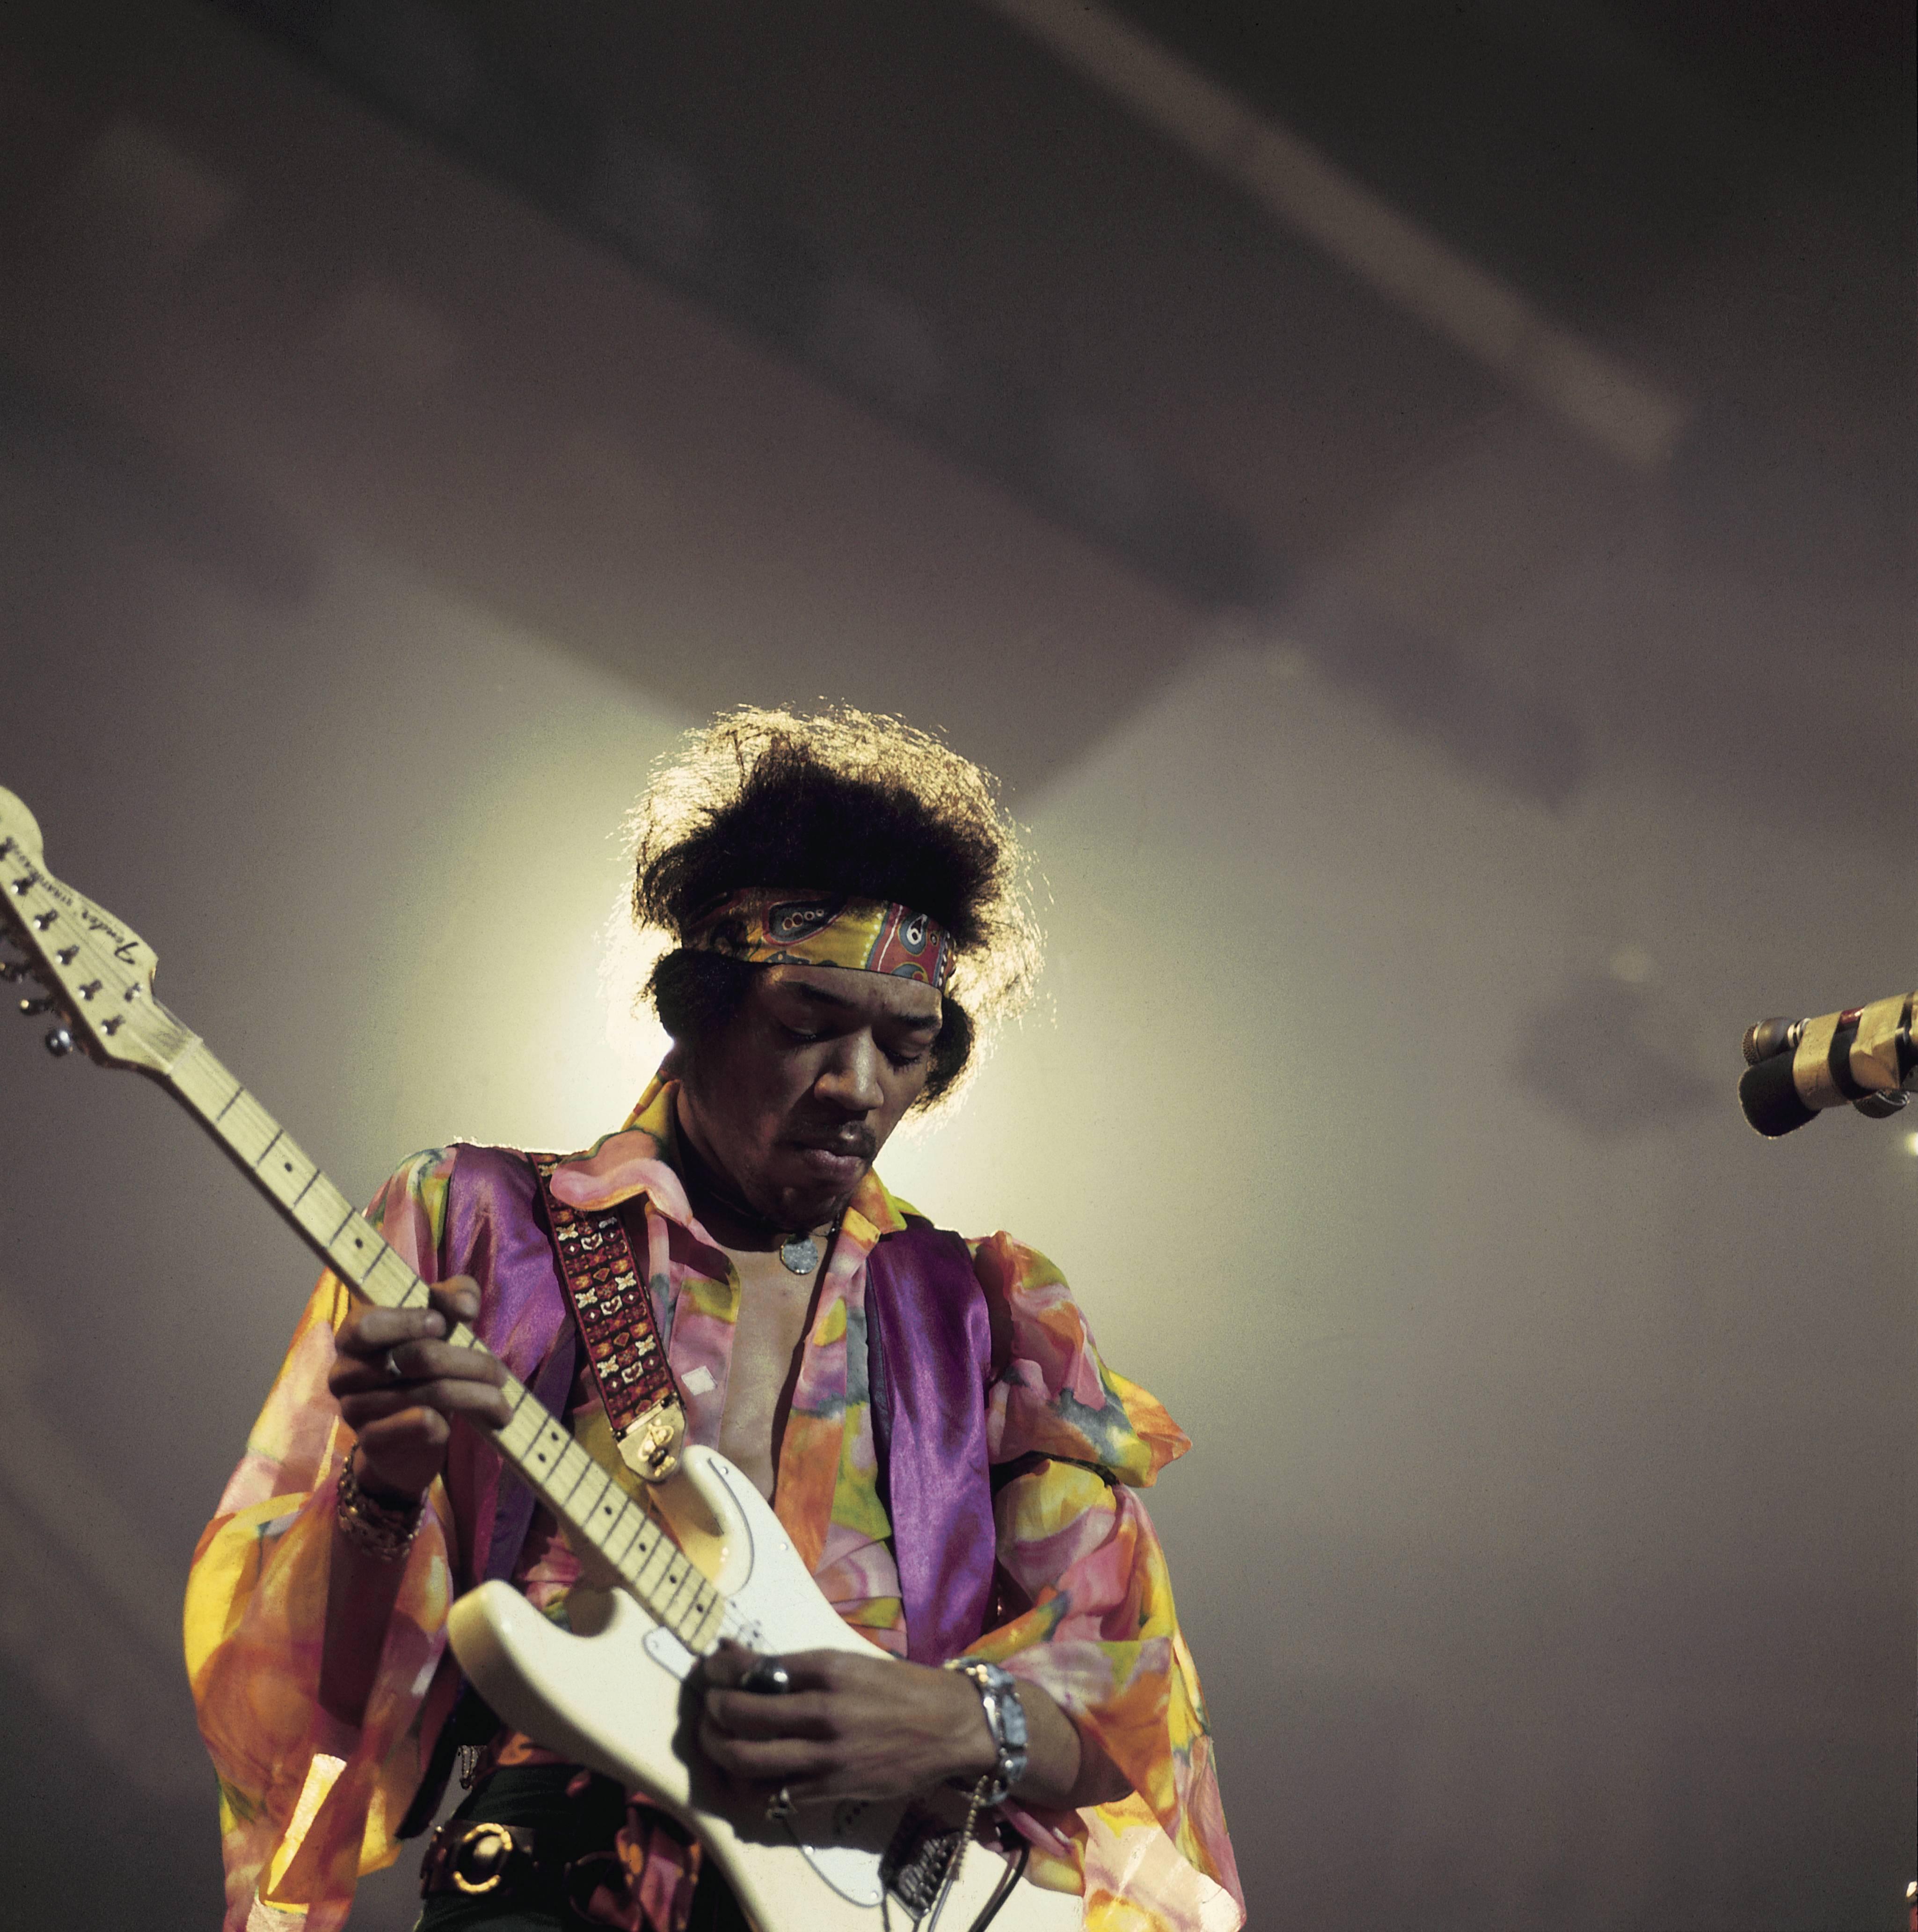 Jimi Hendrix's 'Creative Explorations' From 1969 Returning to Vinyl